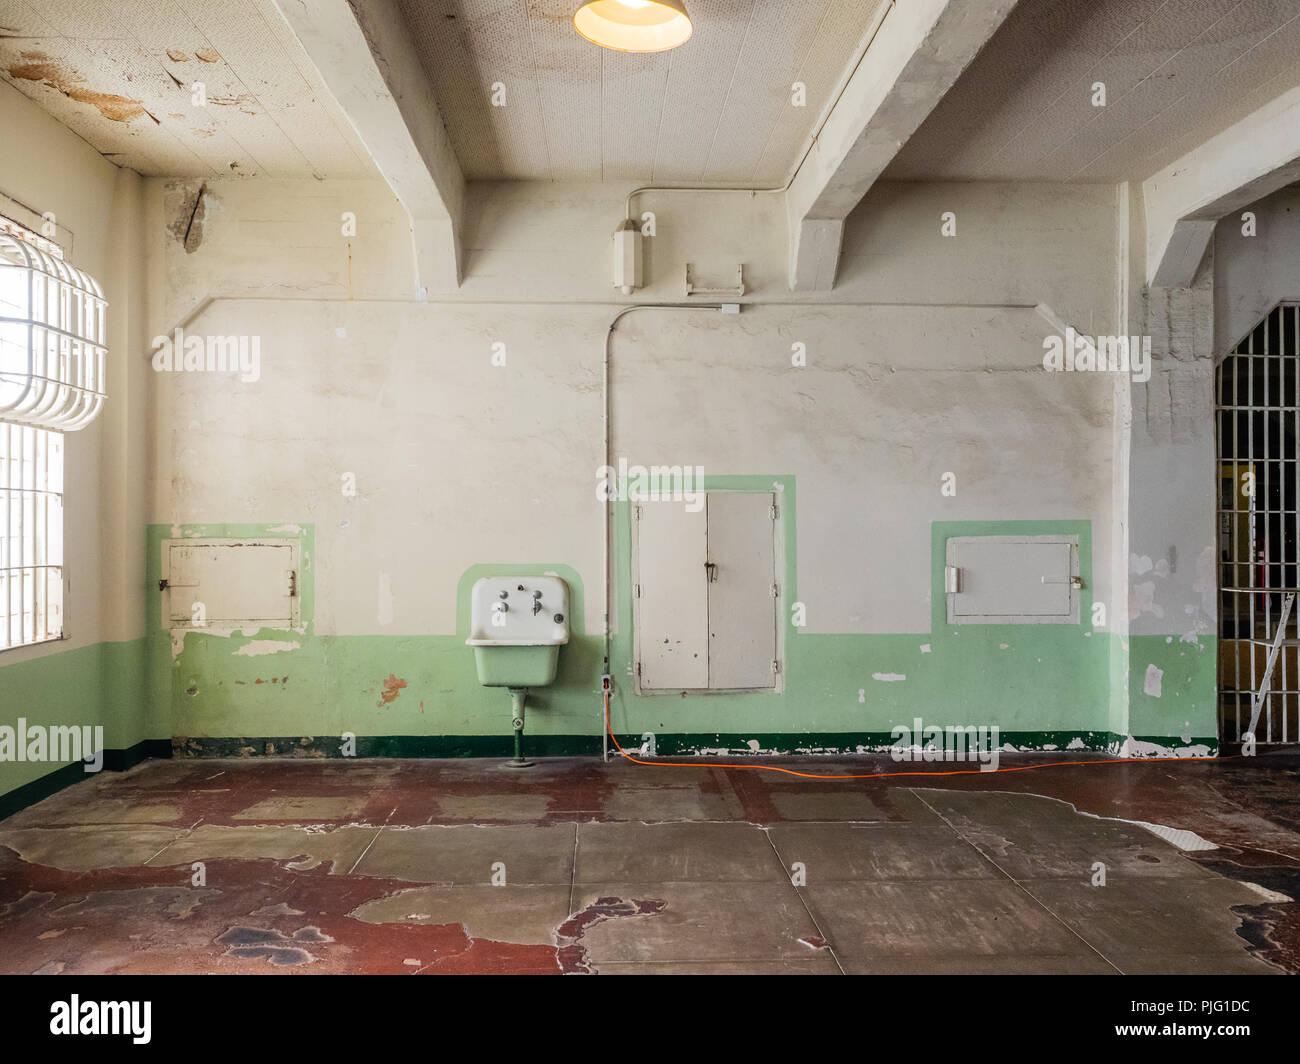 Dining hall of Alcatraz Federal Penitentiary , San Francisco Bay, California, USA. - Stock Image